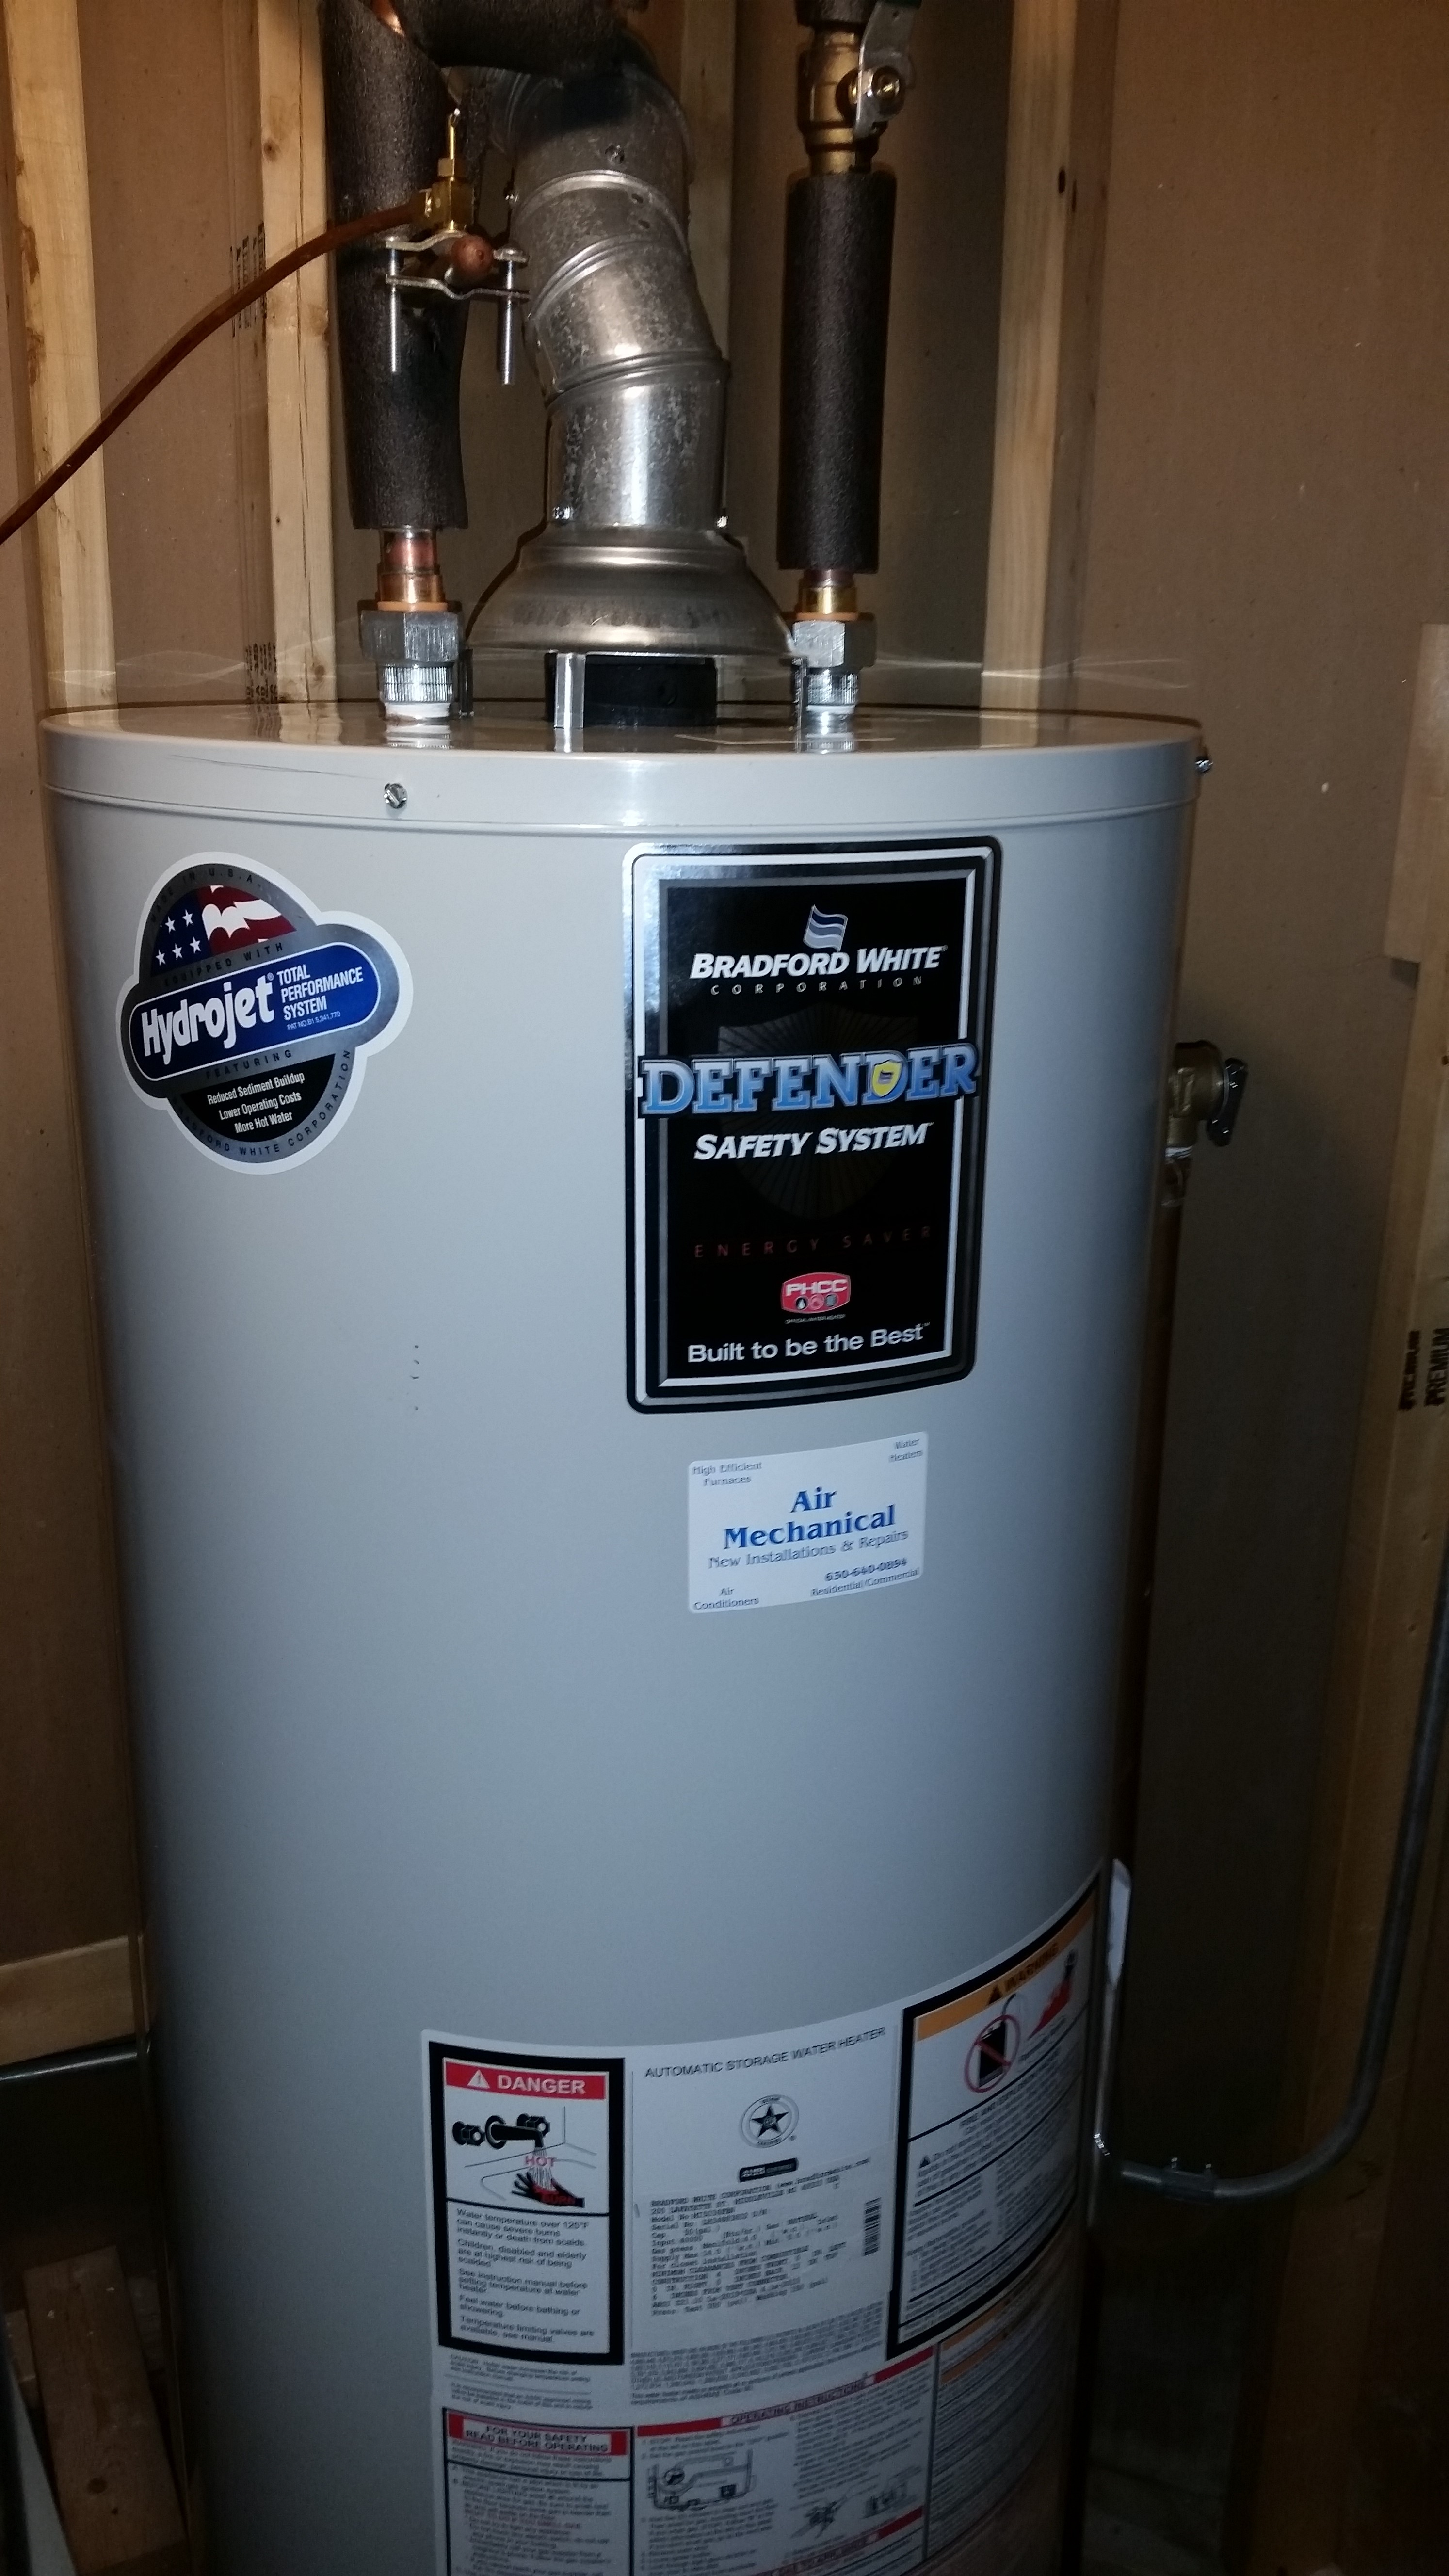 Bradford White Hot Water Heaters Air Mechanical Inc